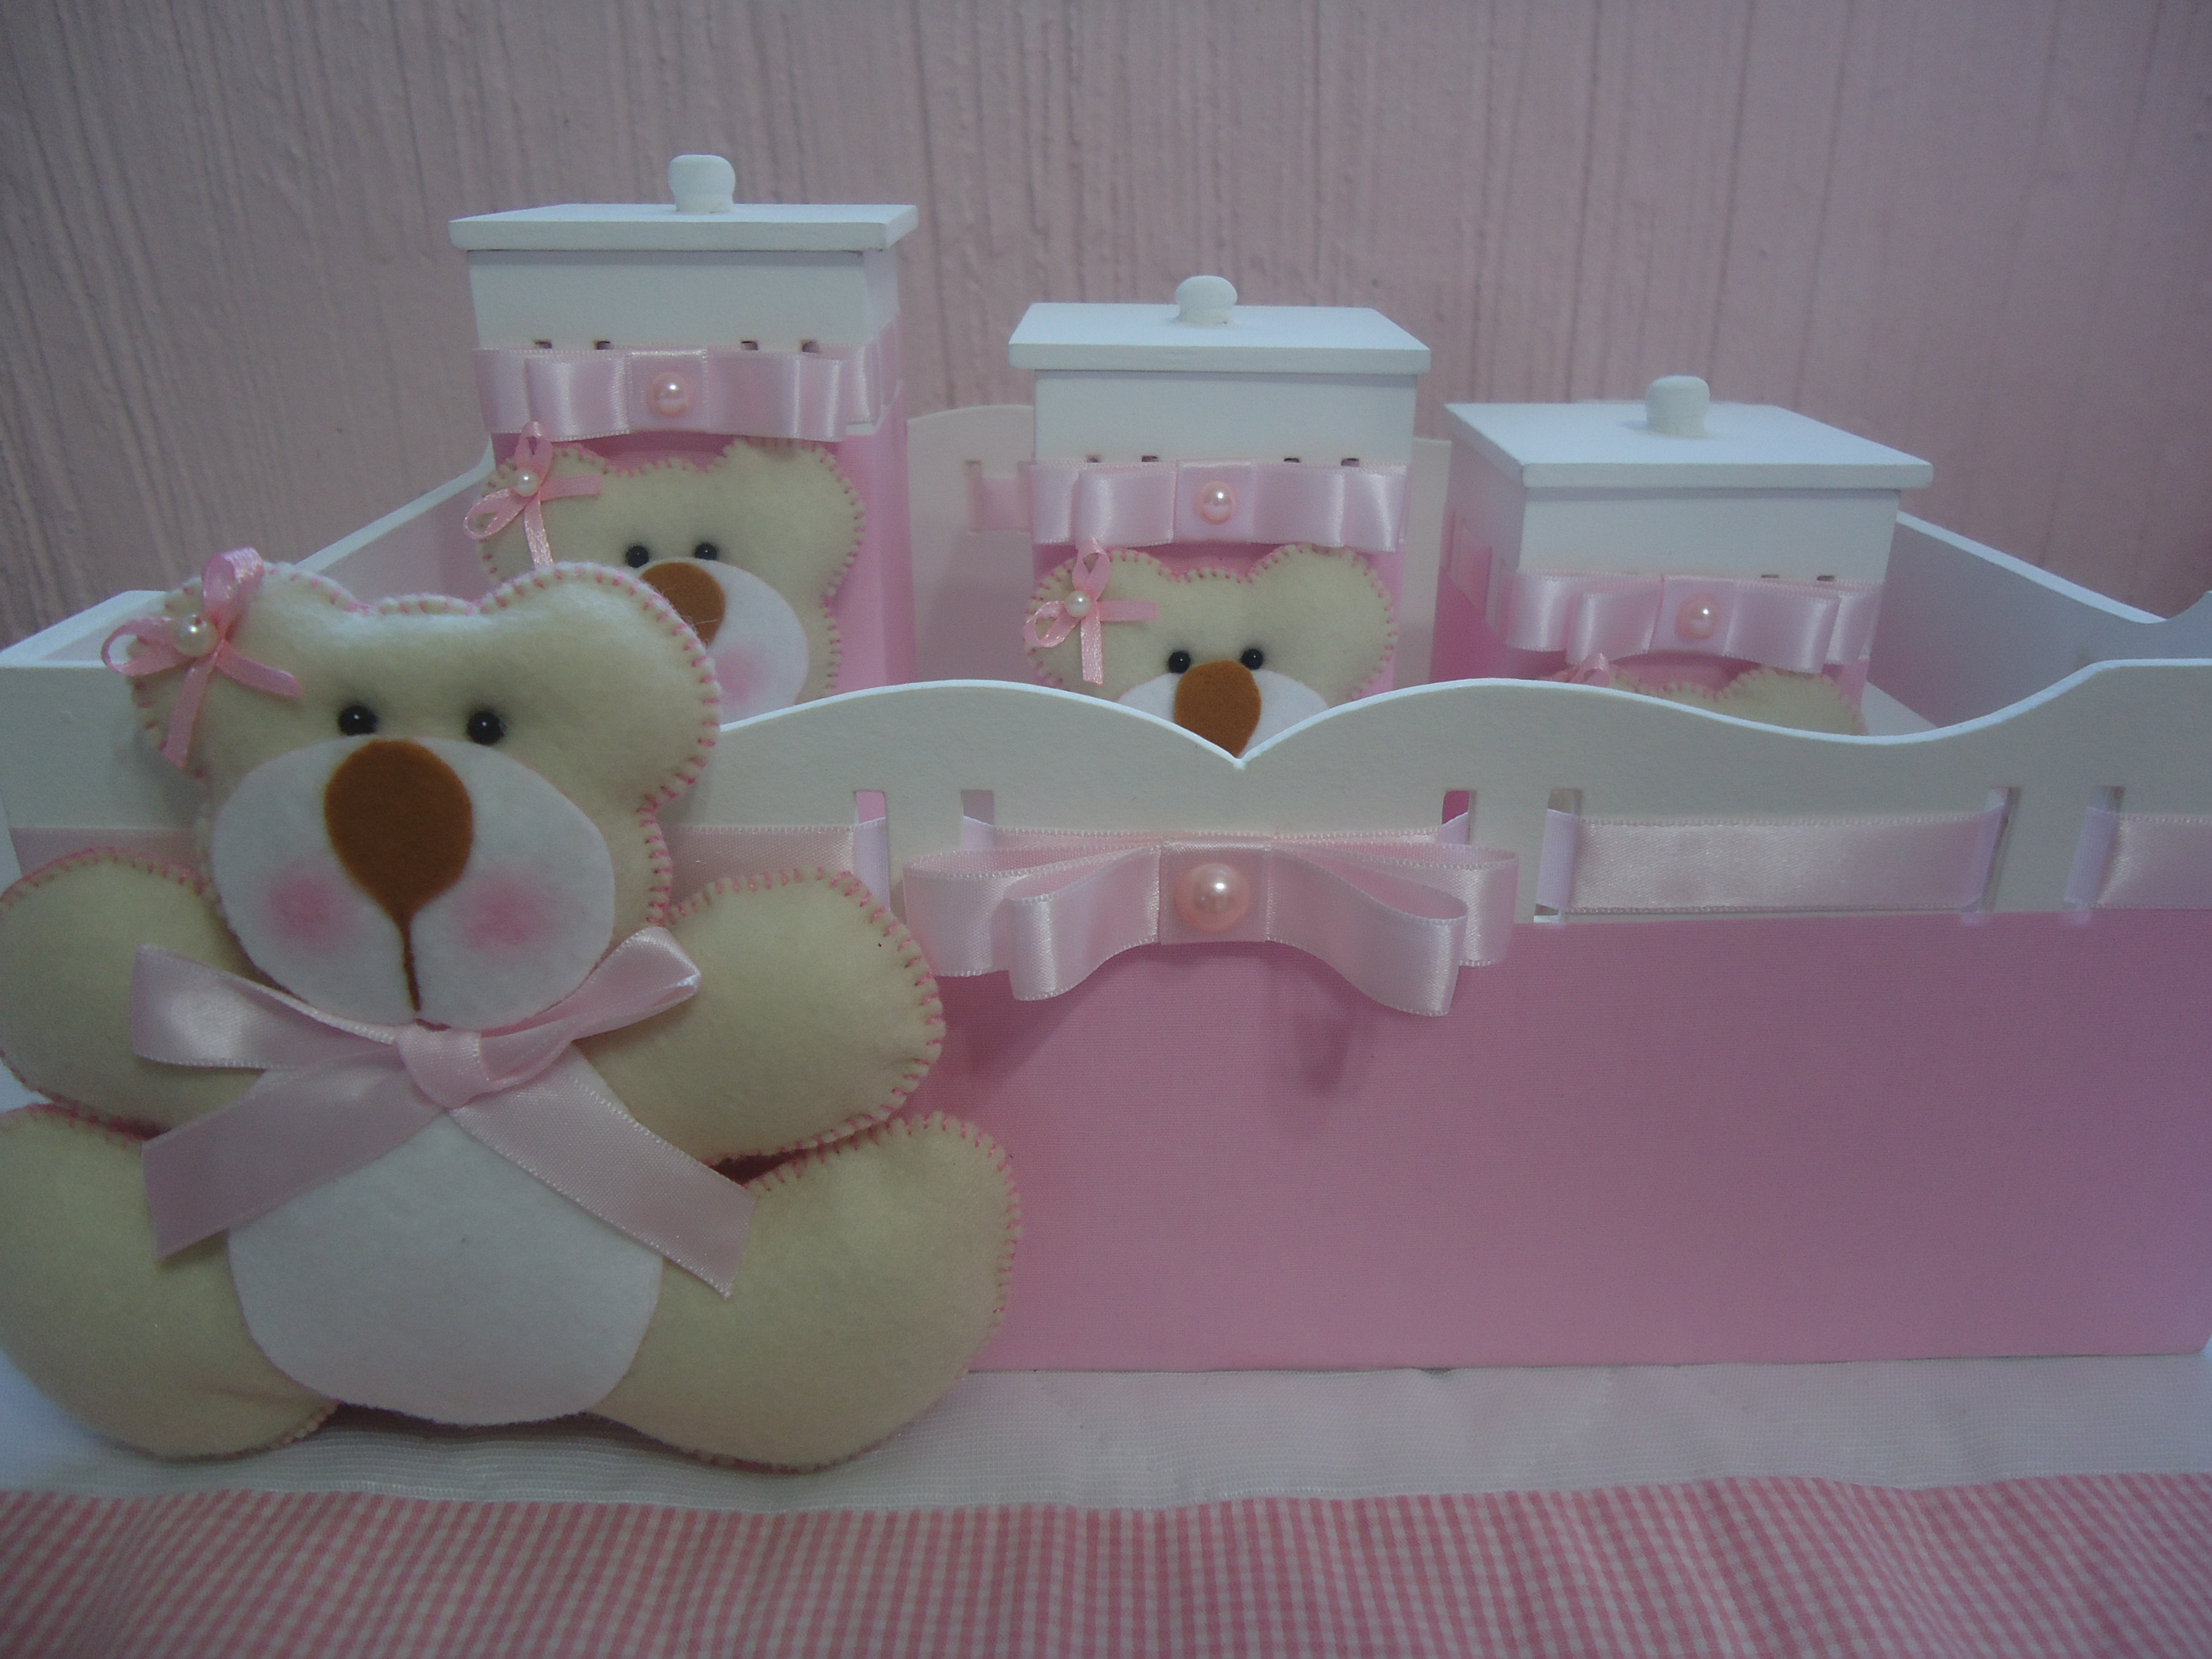 Kit Higiene Bebê Ursa Rosa  Ternura em Feltro  Elo7